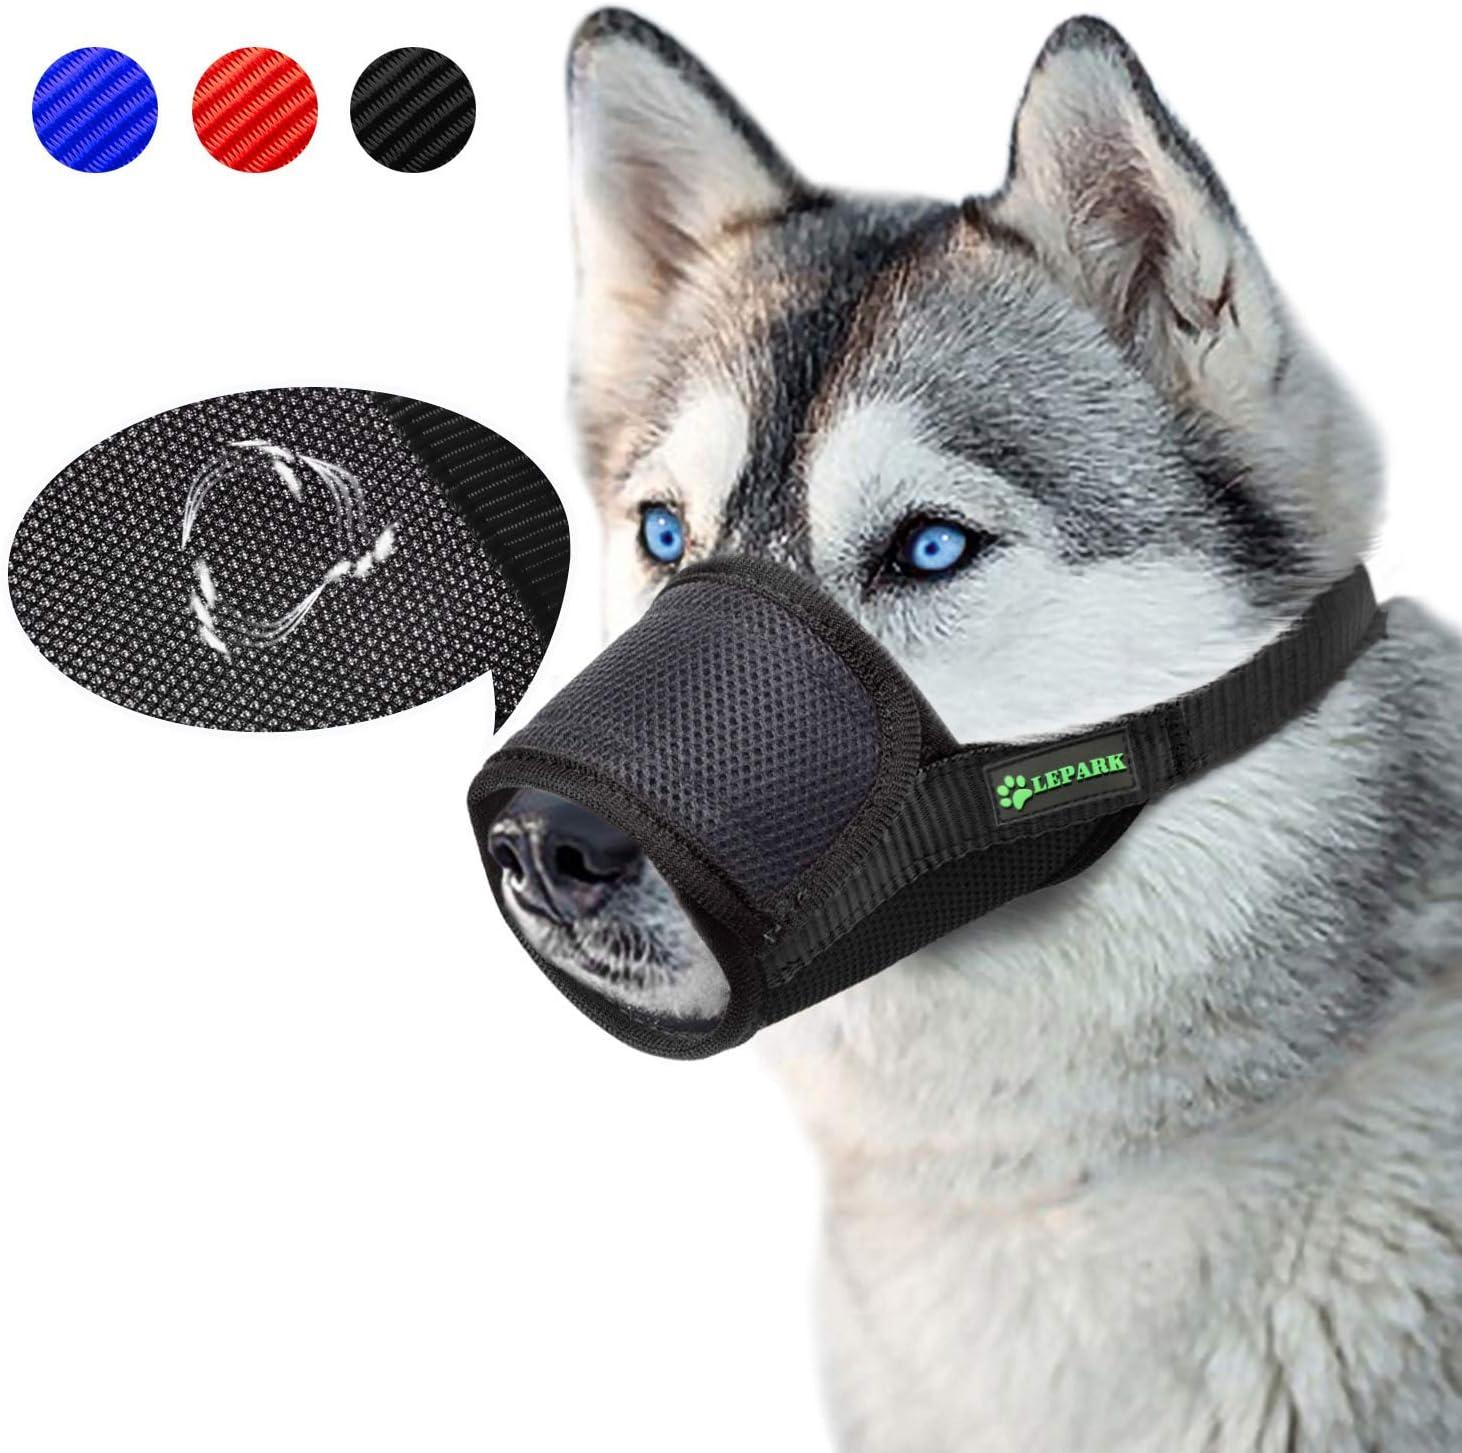 ILEPARK Respirable Bozal de Nylon para Perros Suave Permite Beber, Jadear Bozal Lazo Ajustable (L,Negro)